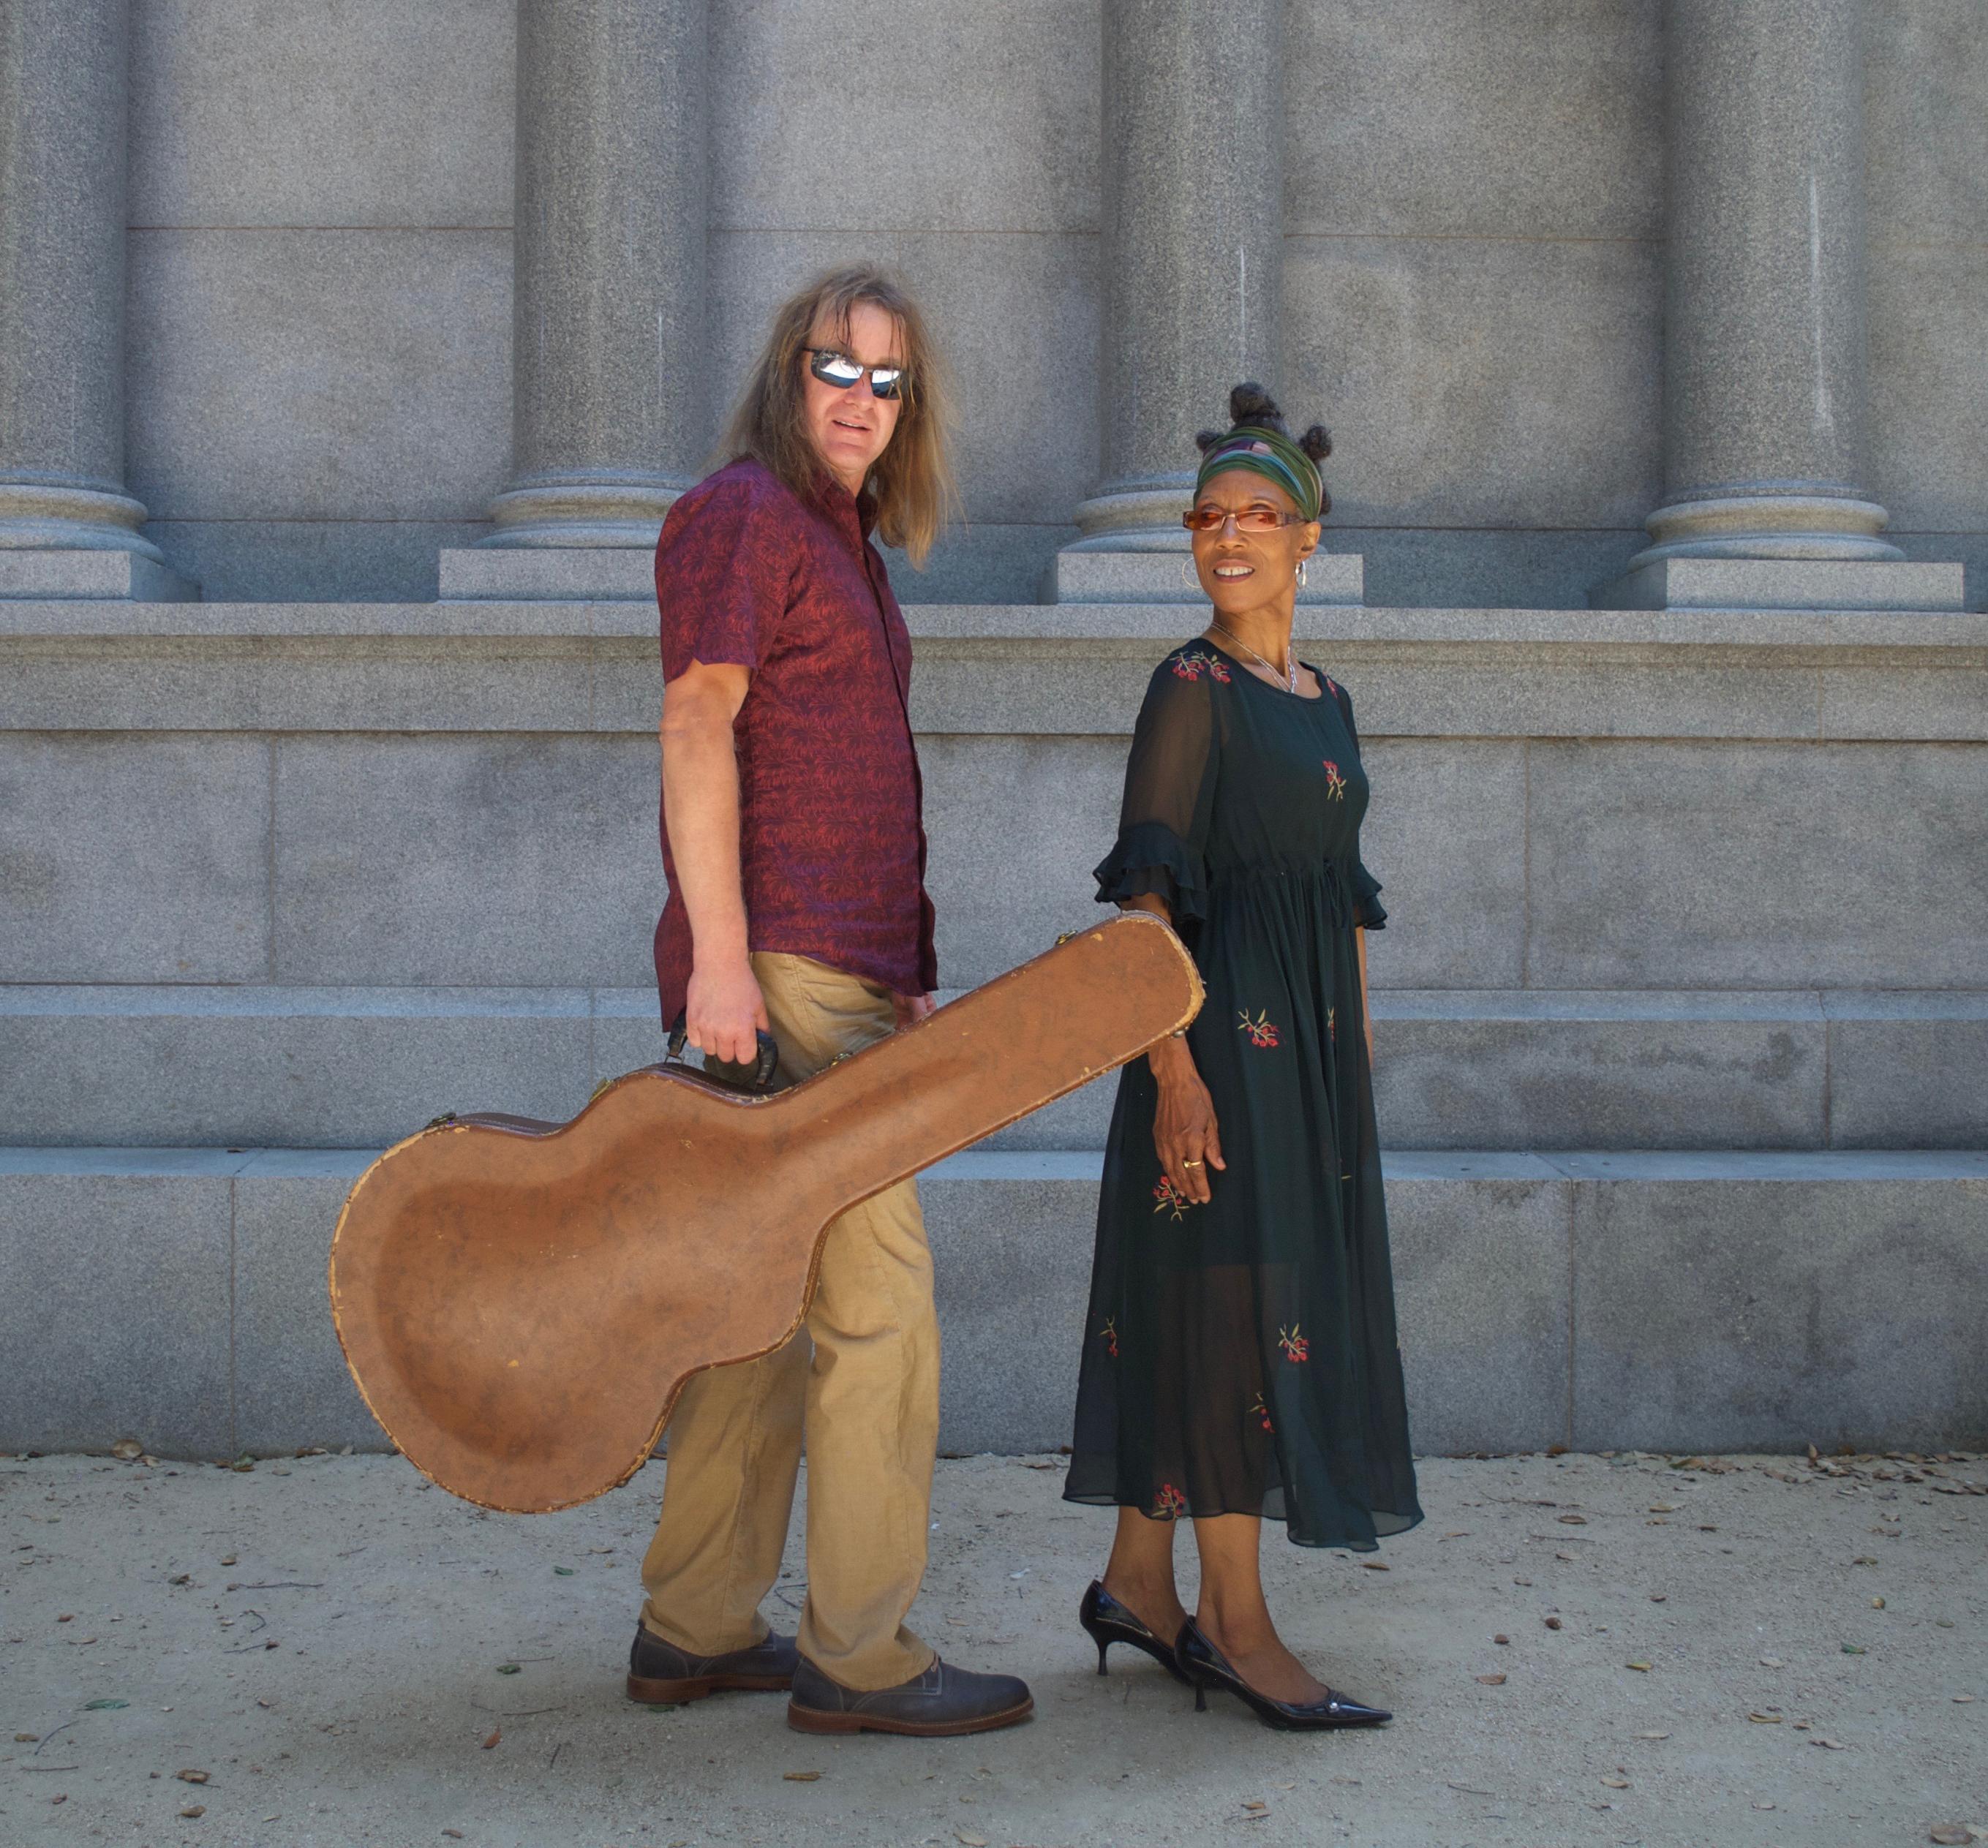 Peter & Yolanda